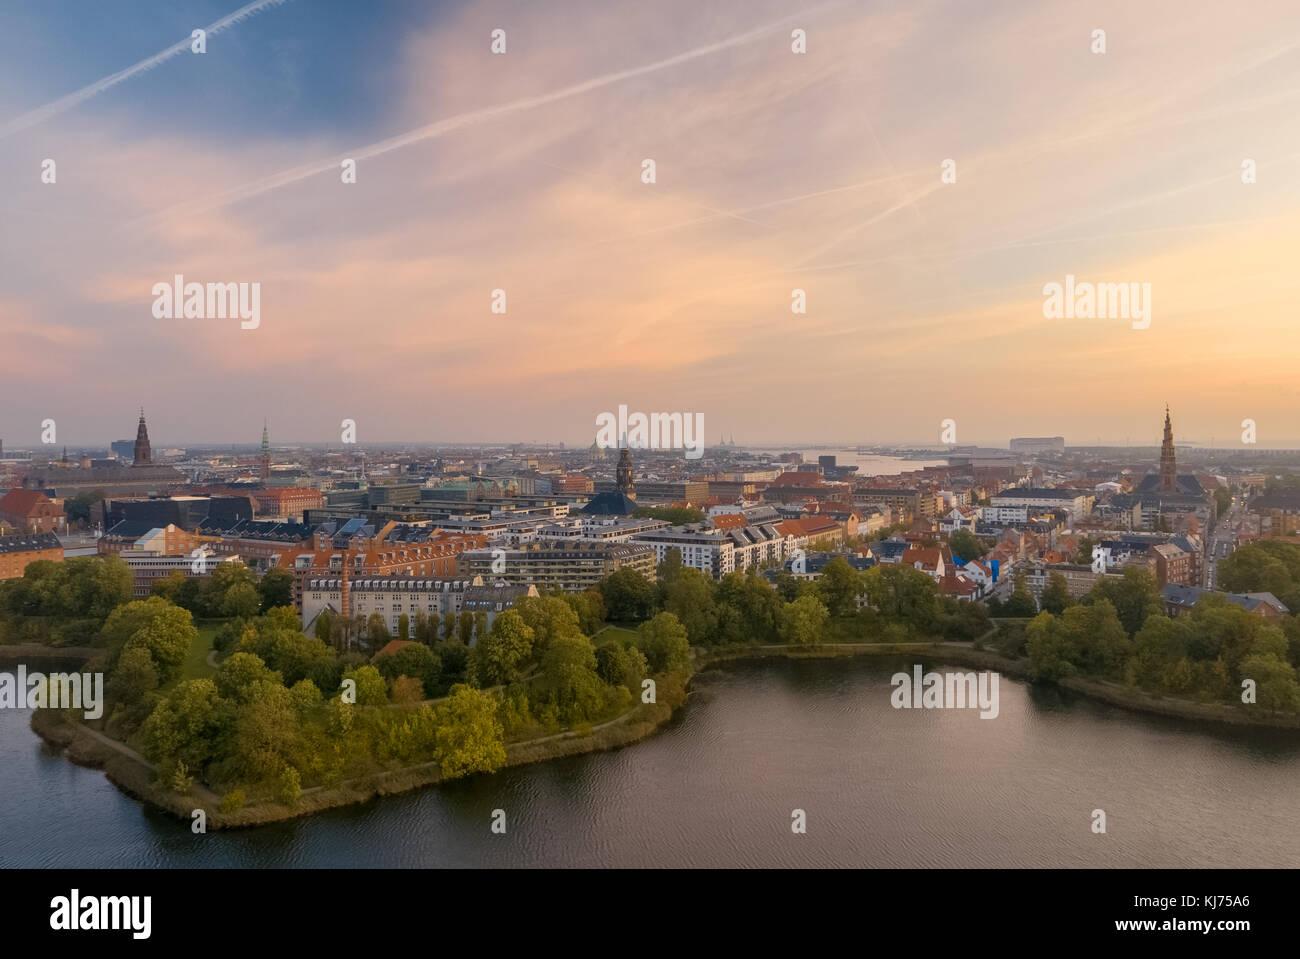 Horizonte de Copenhague al amanecer. Imagen De Stock